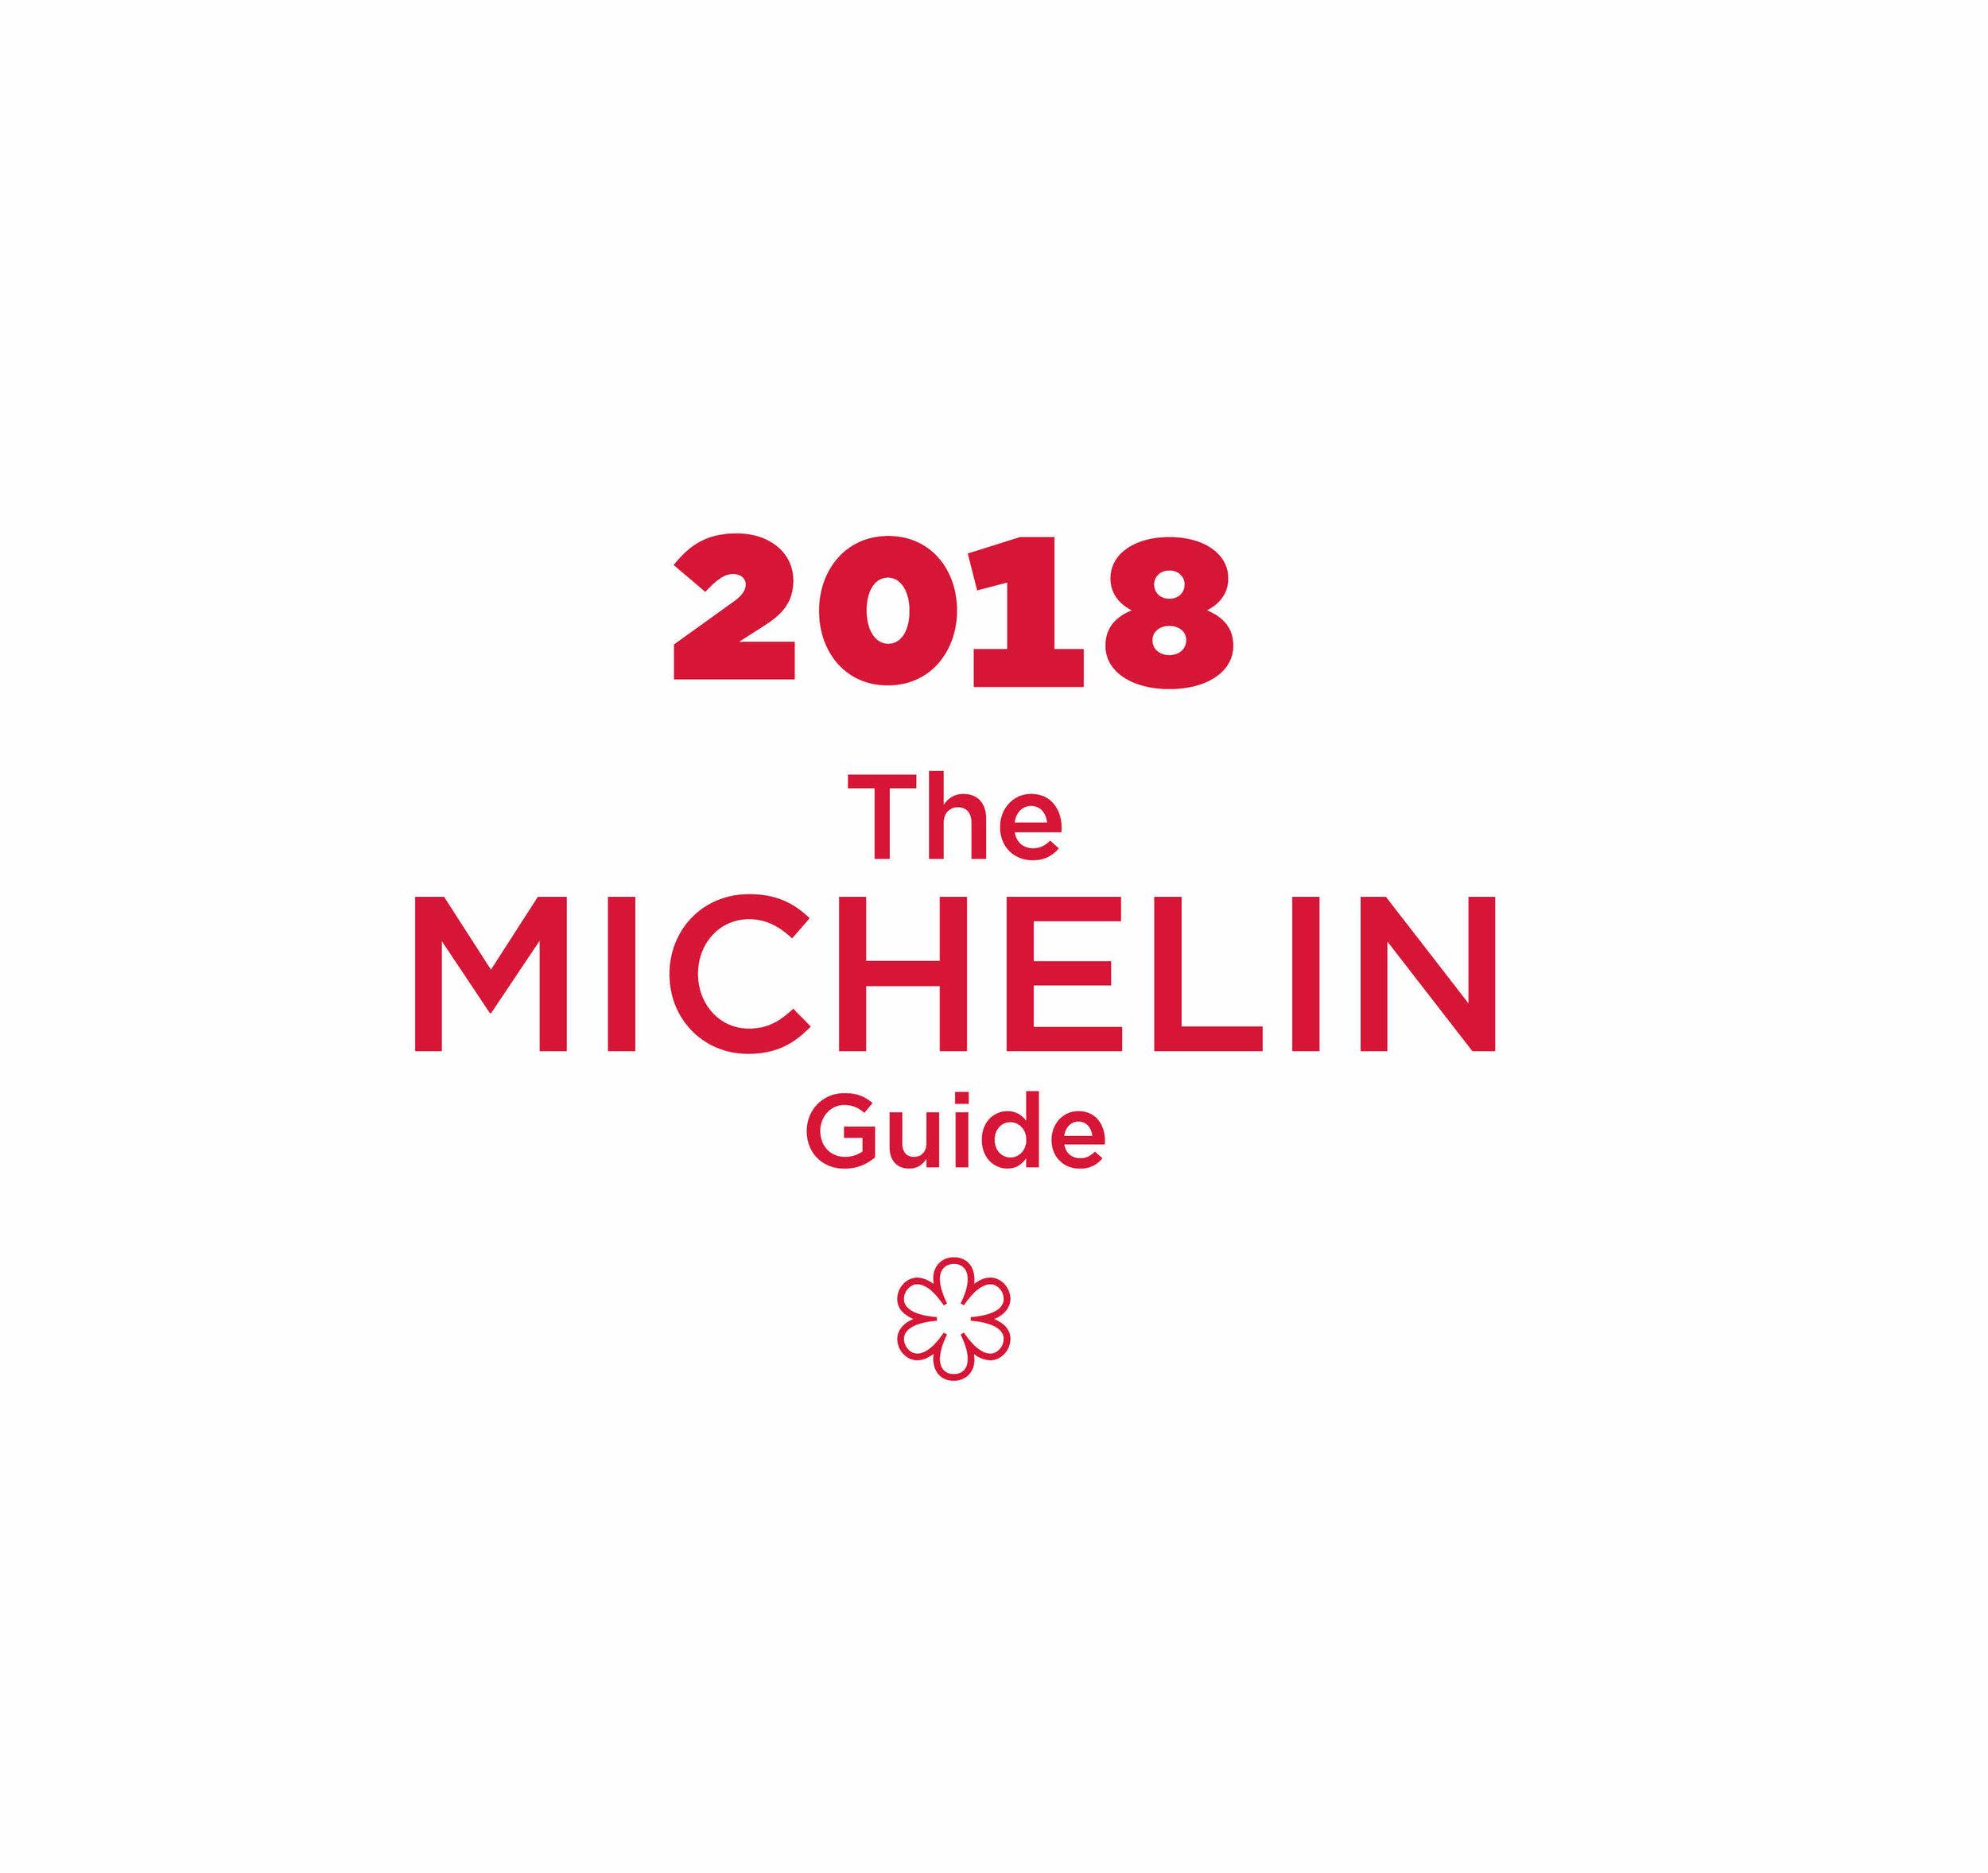 MG_jacket_red_1_2018.jpg